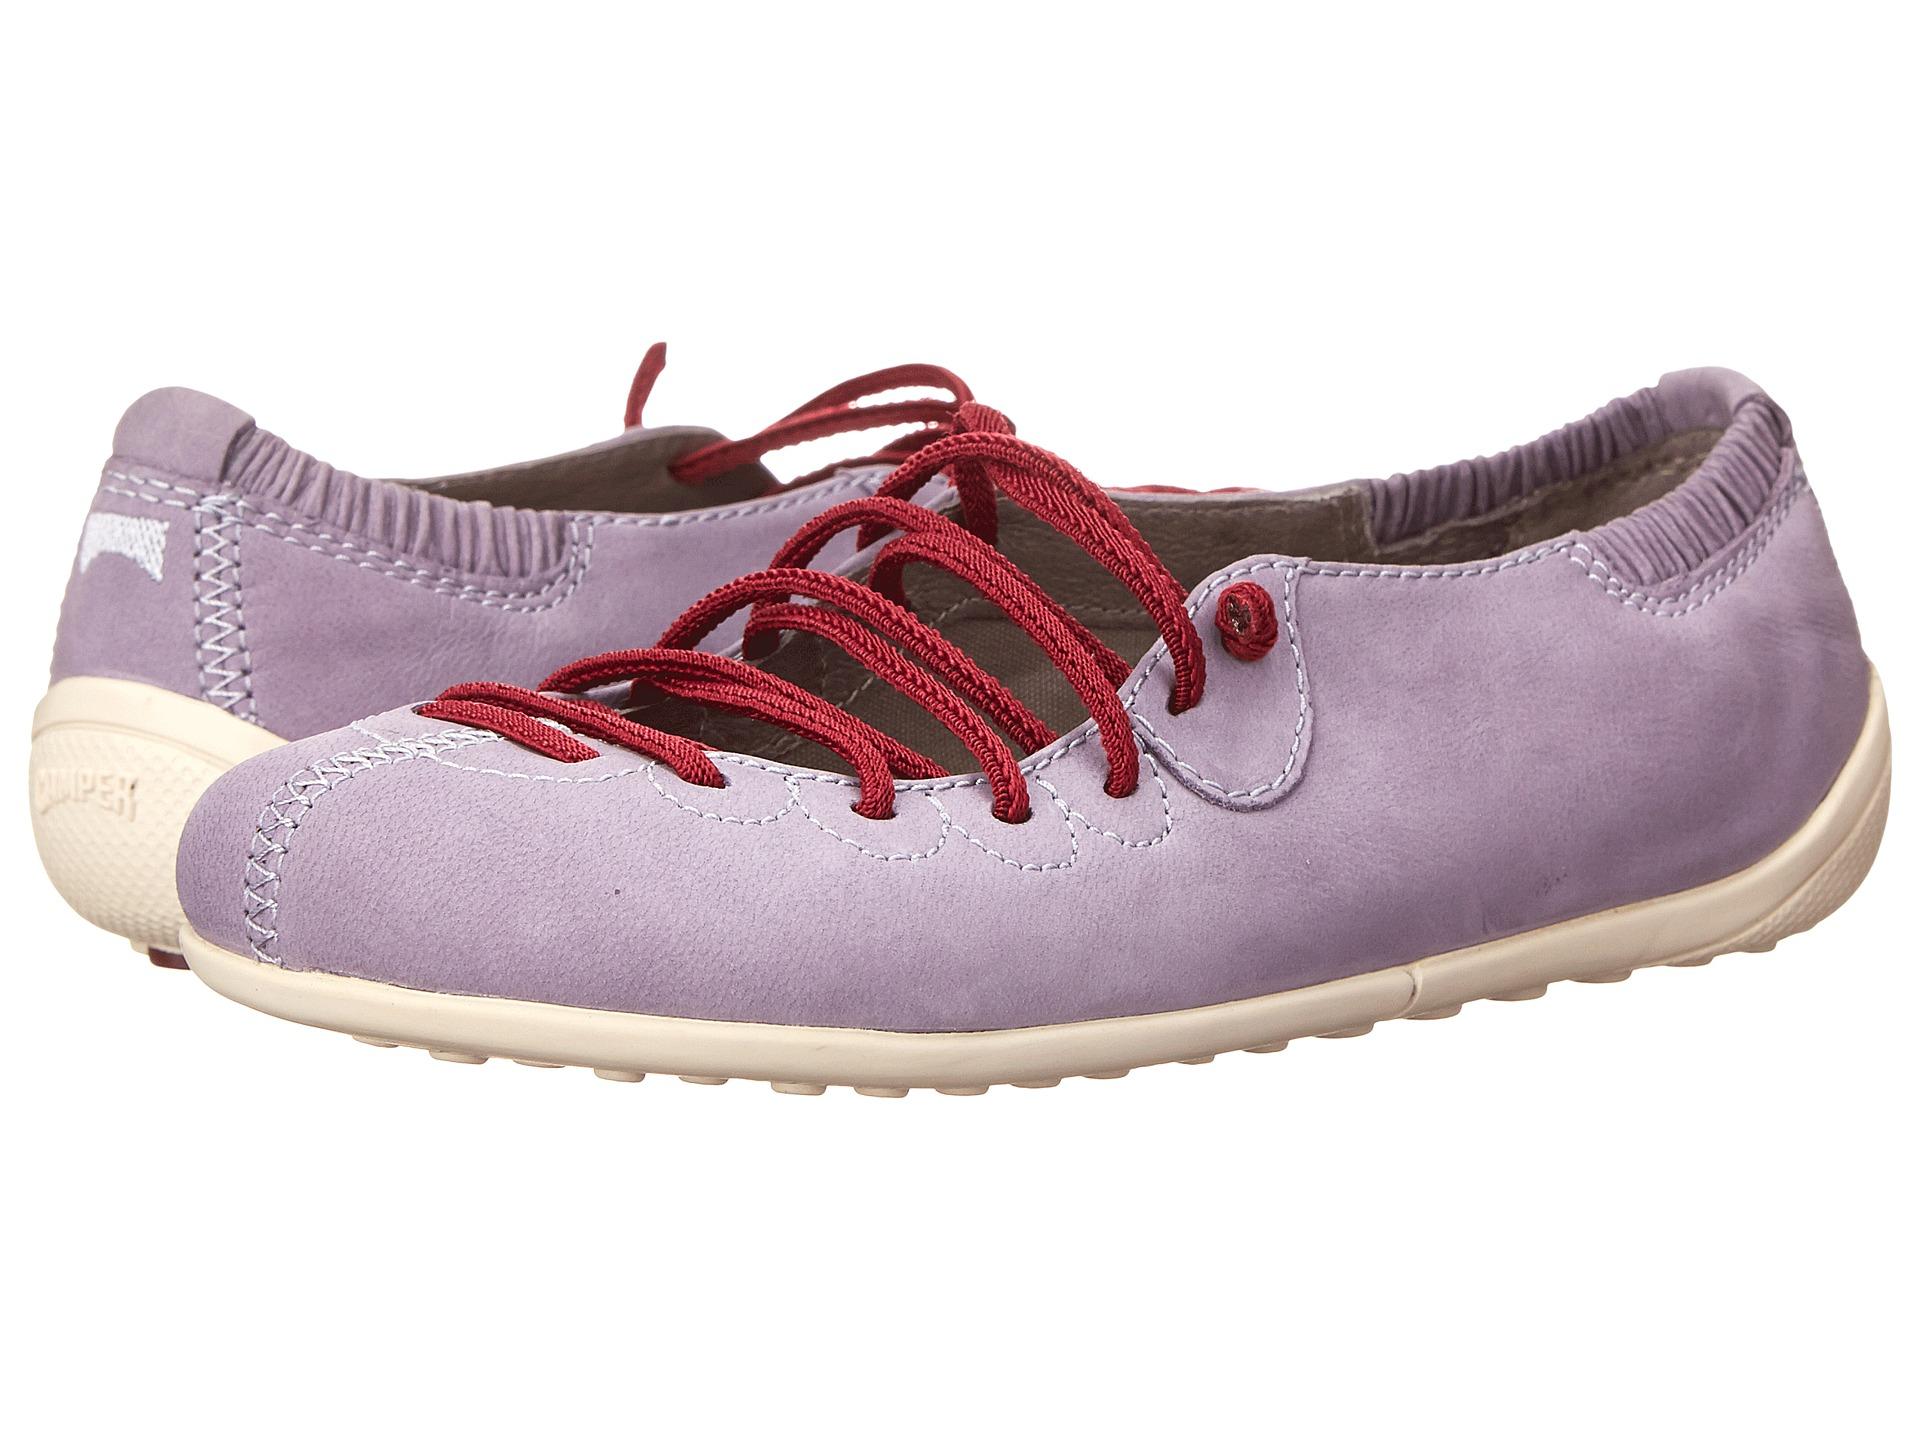 lace-up sneakers - Pink & Purple Camper rmQKT